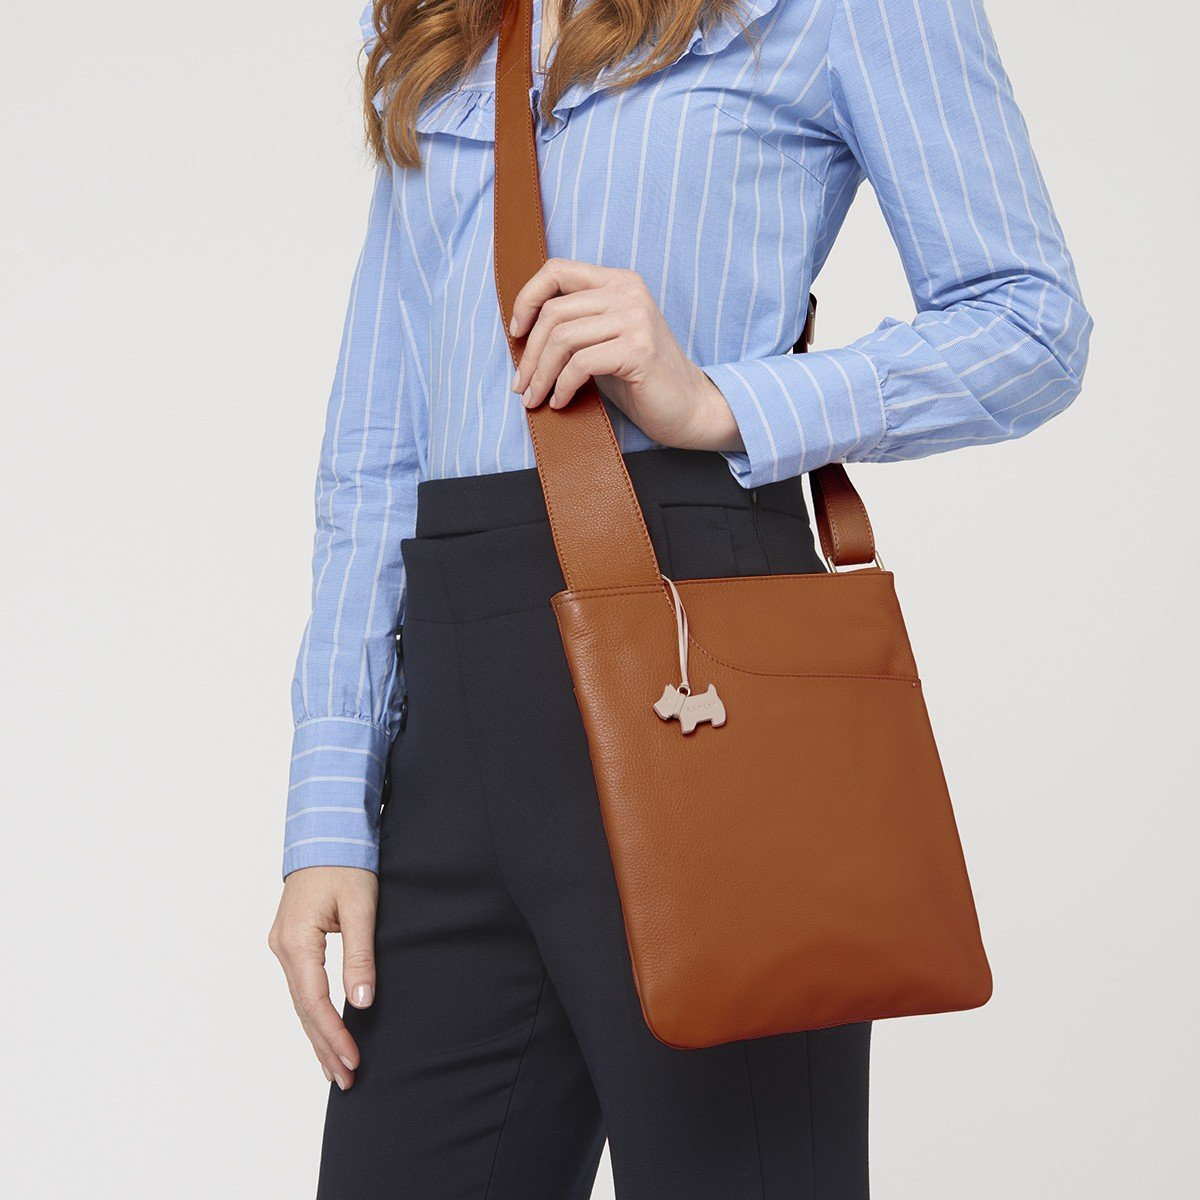 b444ad8fa5 Radley Handbag Pocket Bag. Medium Cross Body Bag 90102 Brown  Amazon.co.uk   Shoes   Bags